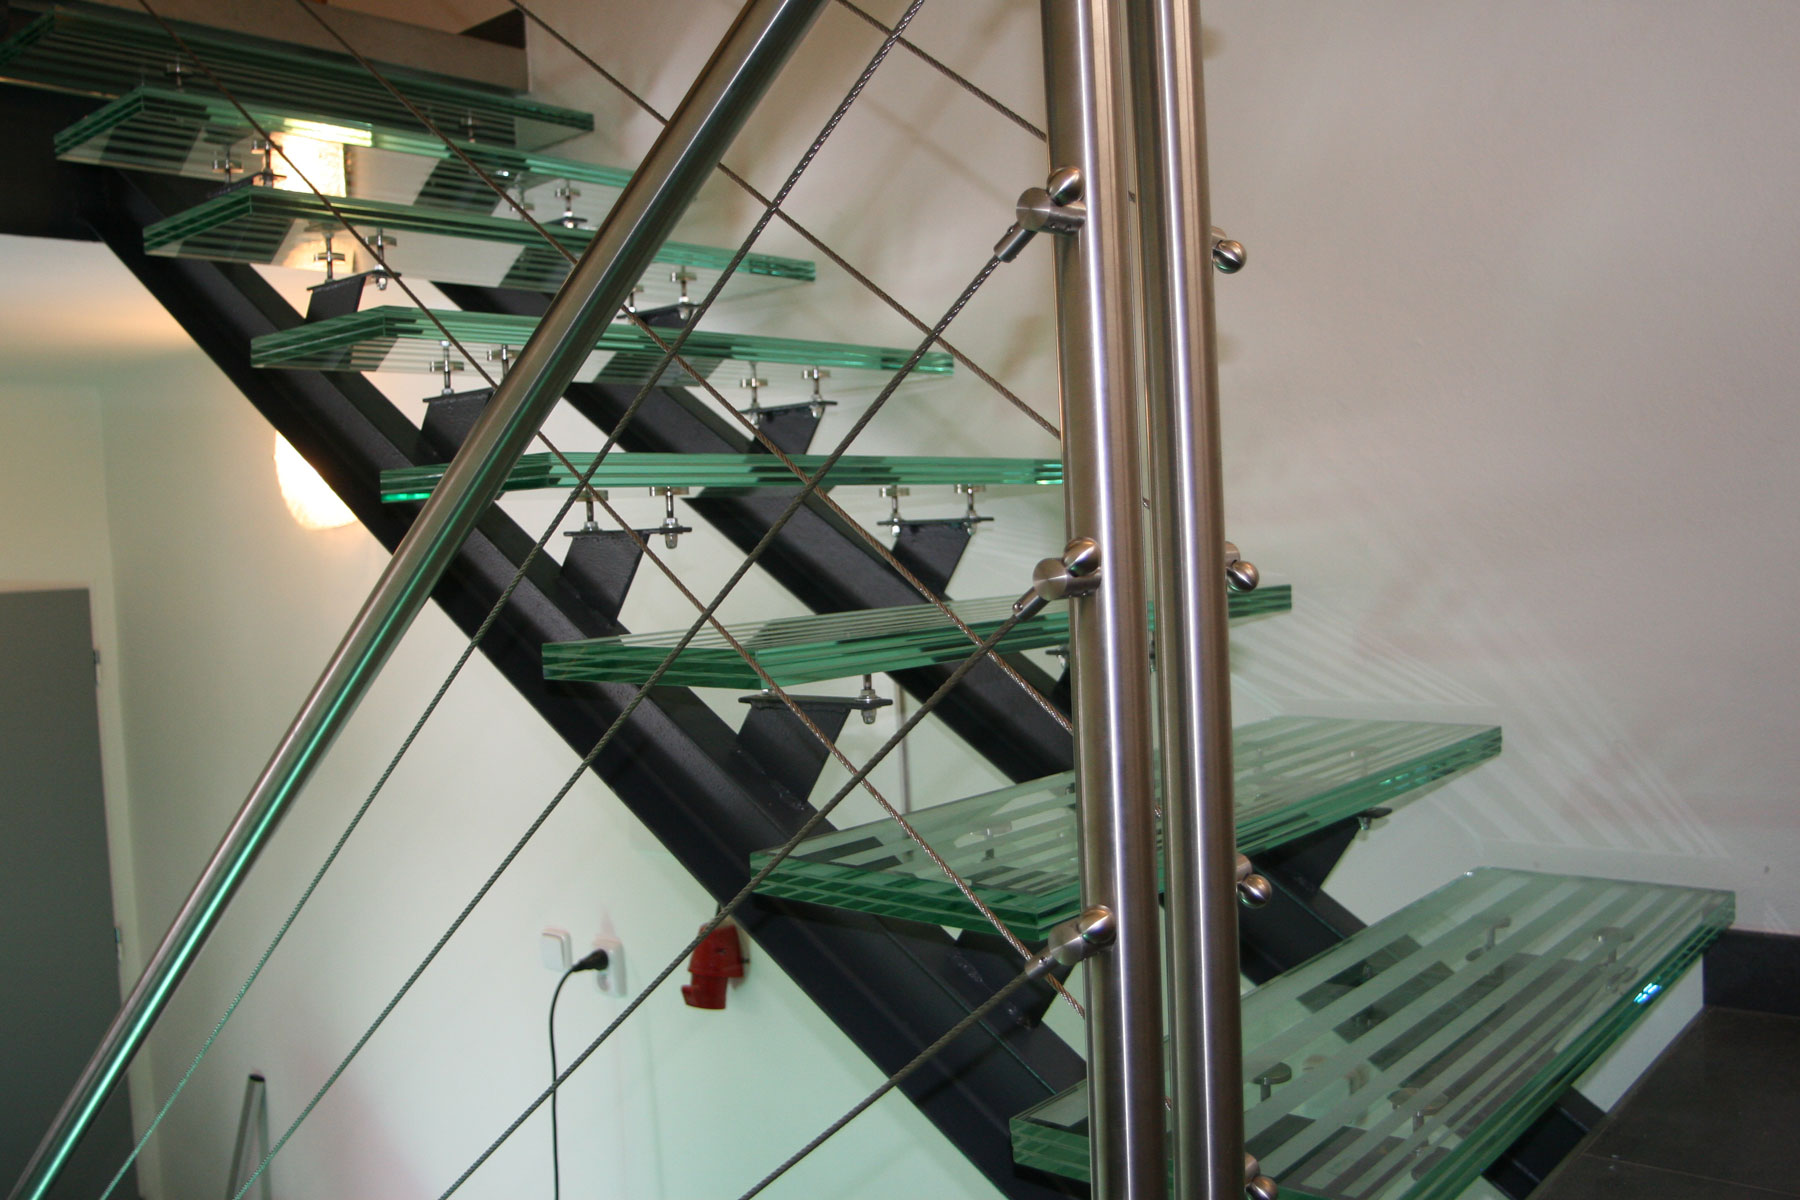 Sklenarstvi-Prerost-schody-a- pochozi-sklo (22)